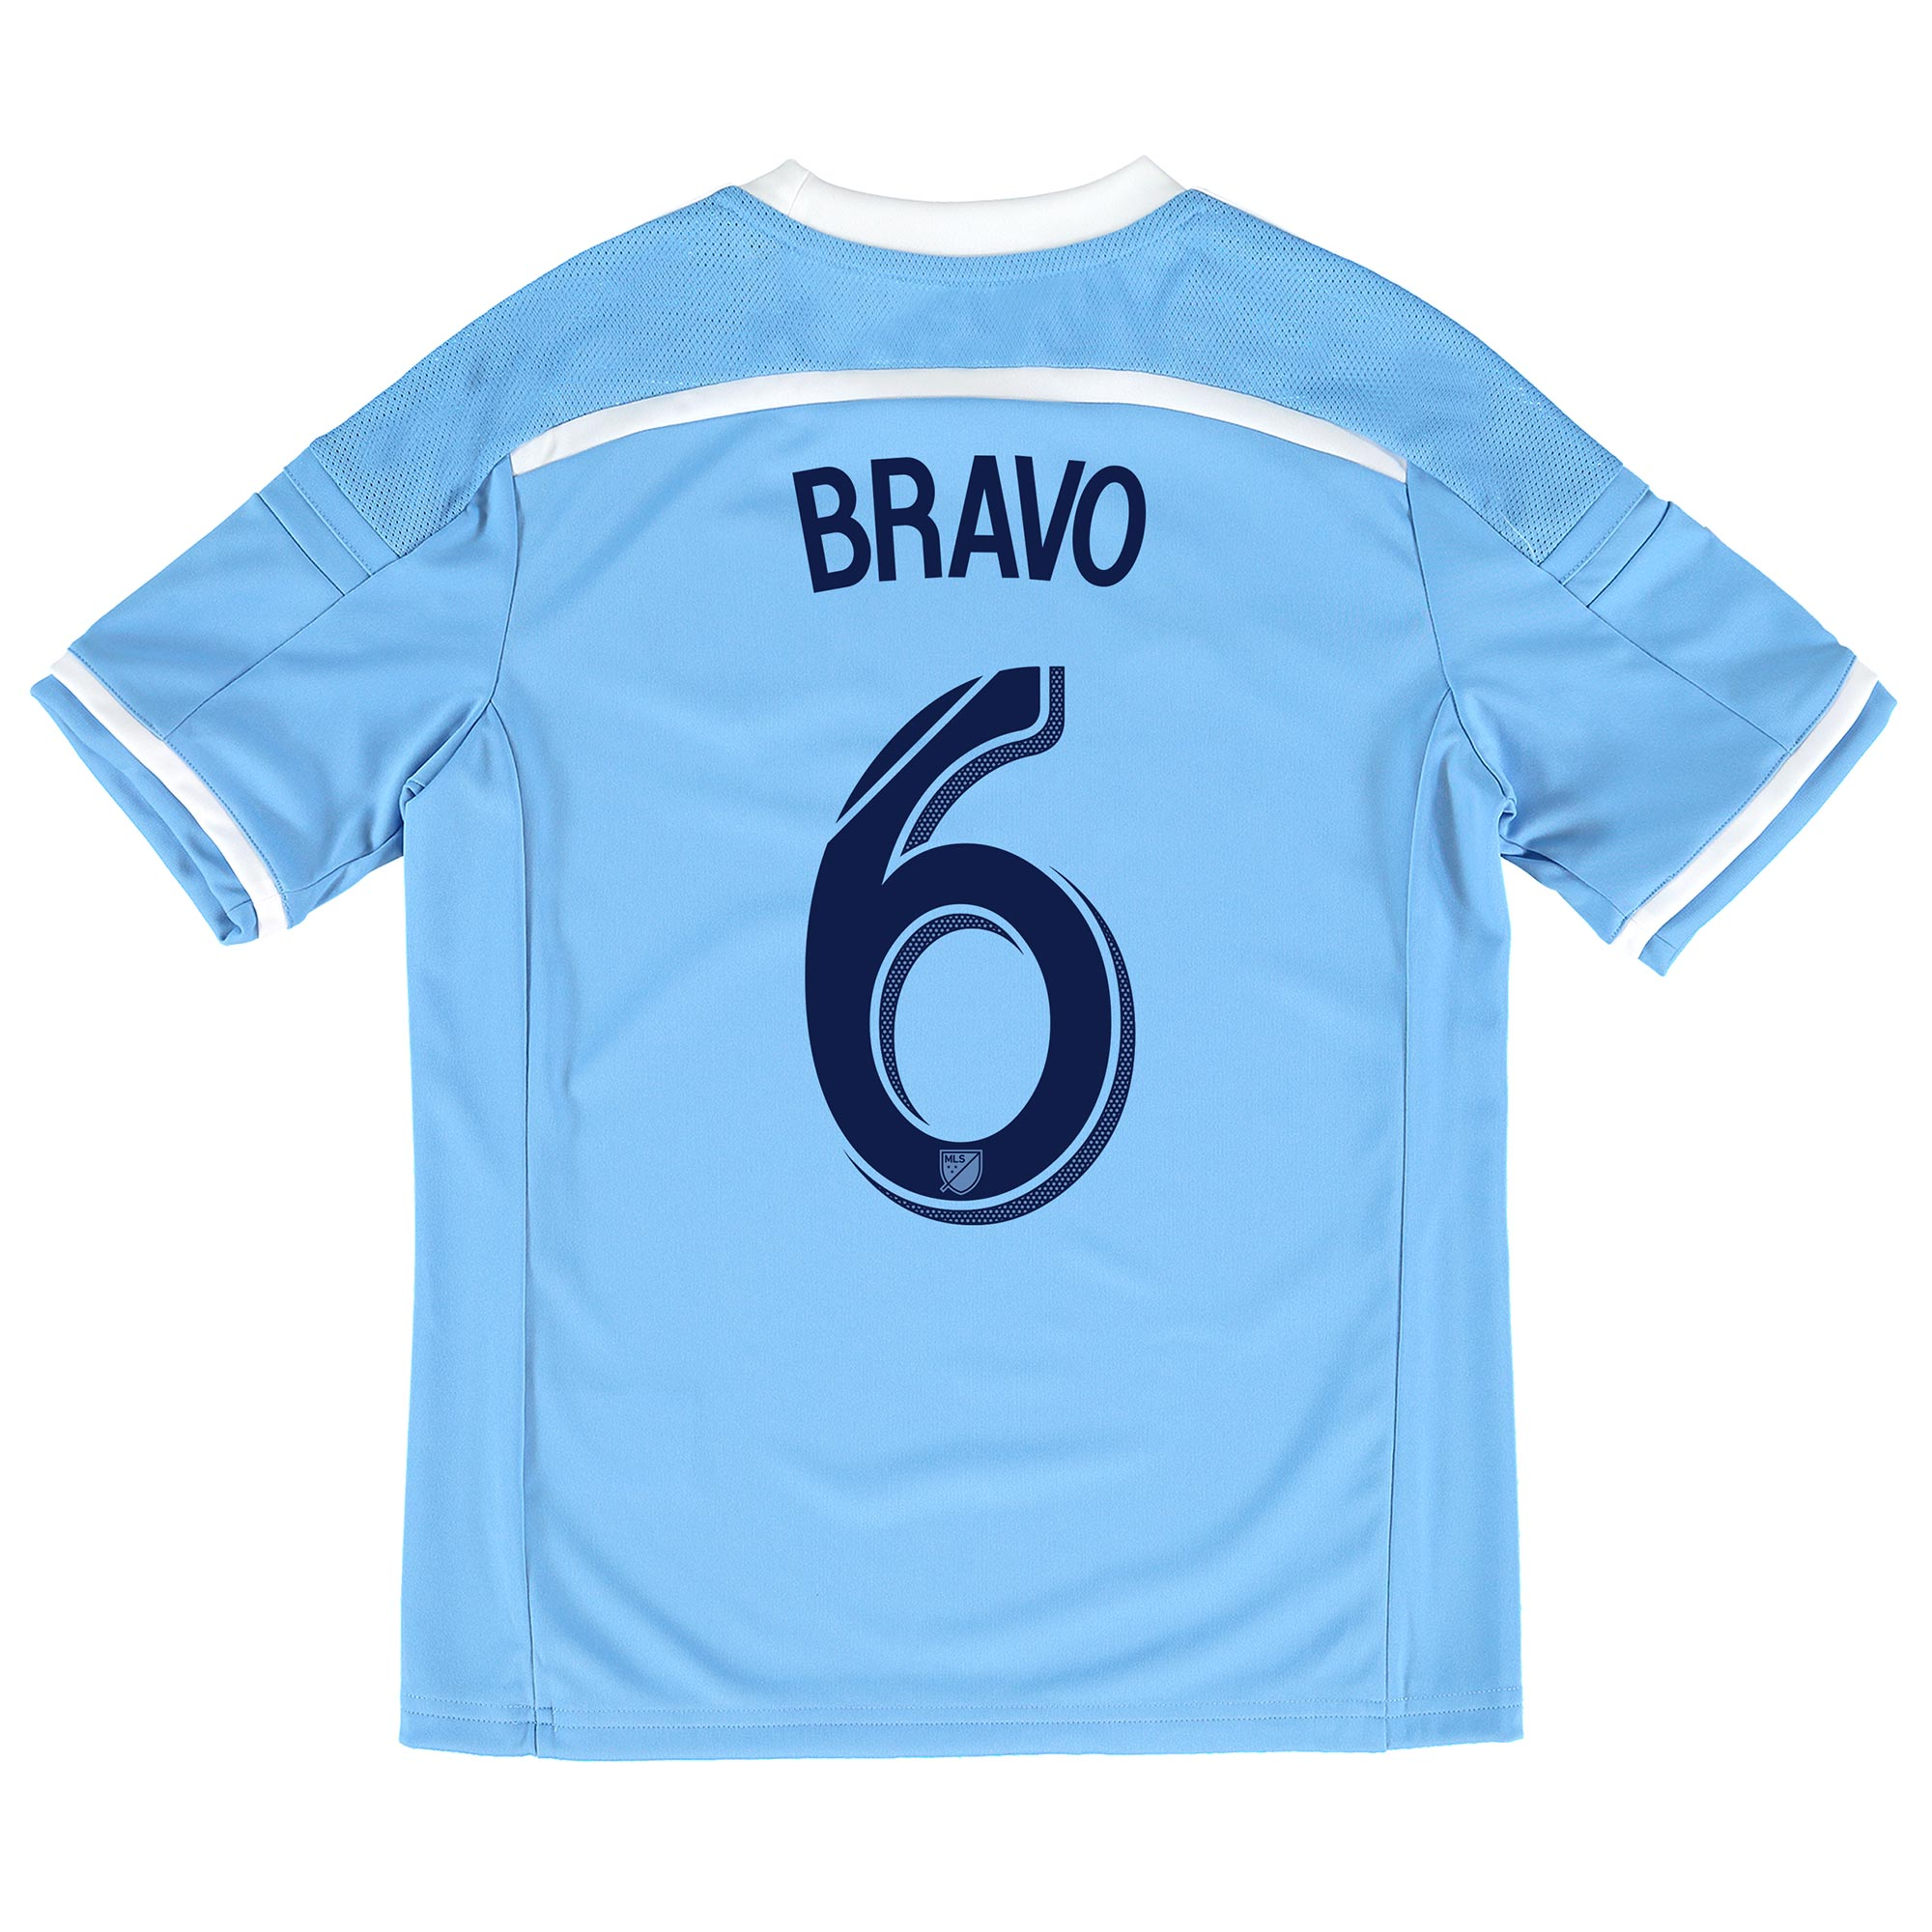 New York City FC Home Shirt 2015-16 - Kids with Bravo 6 printing